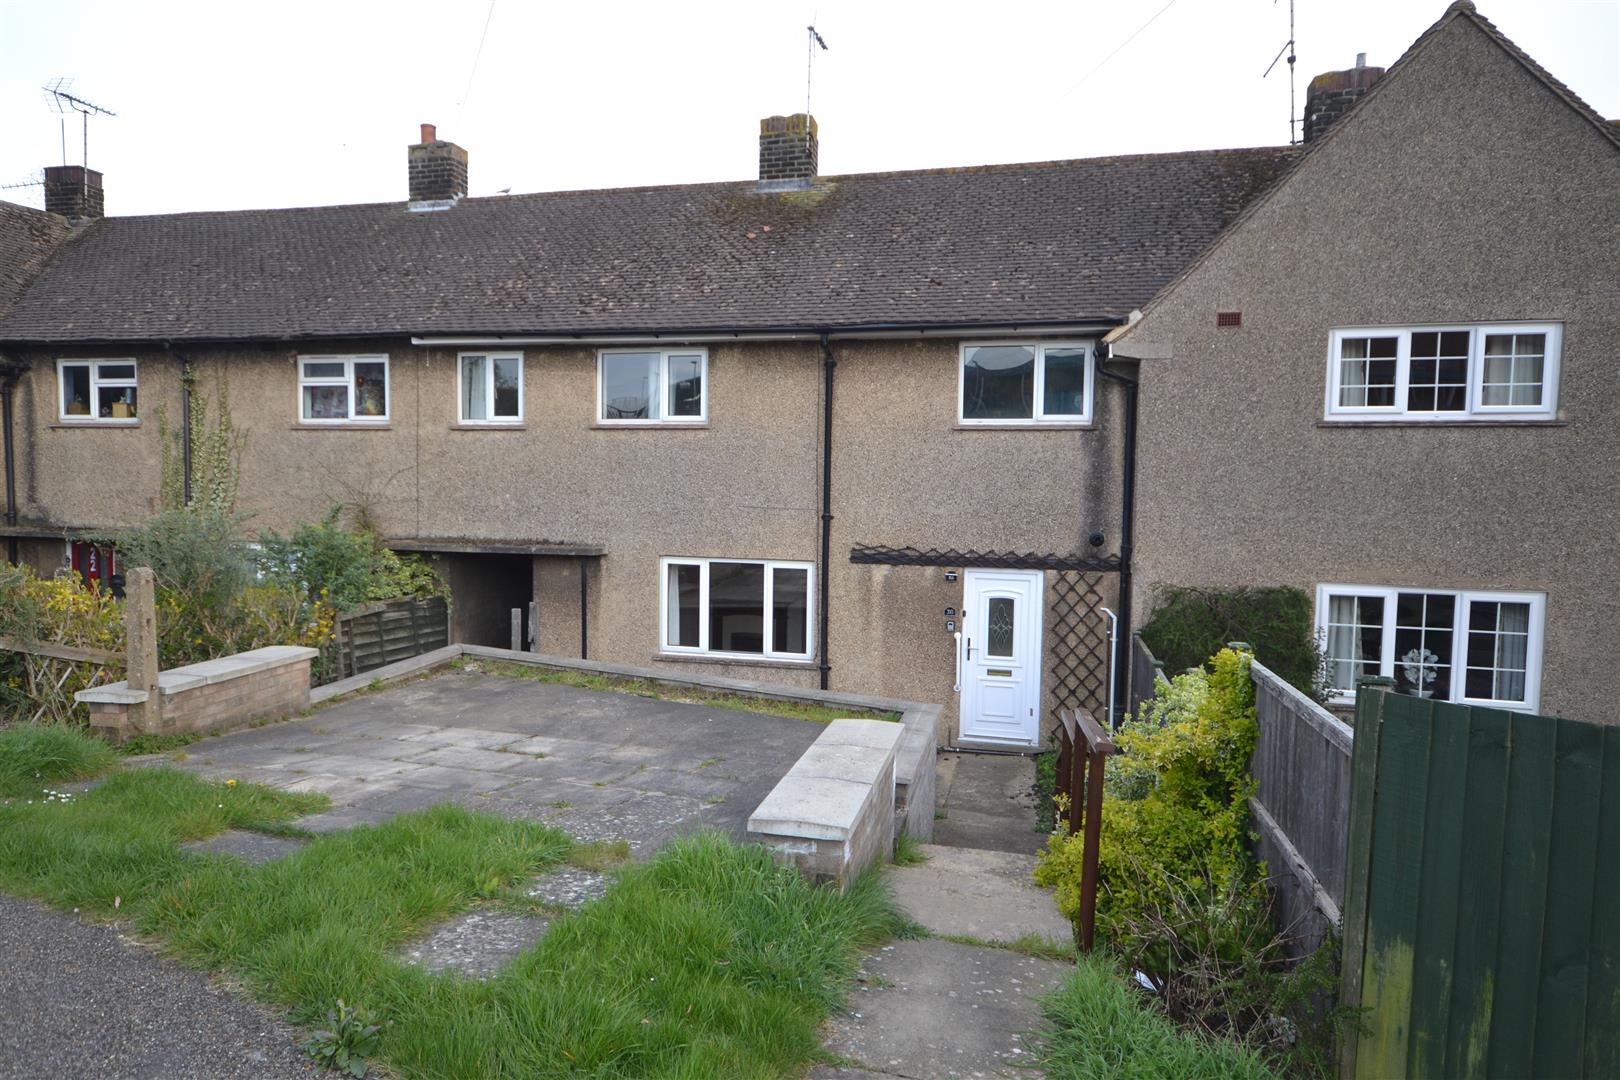 4 Bedroom House - Mid Terrace -